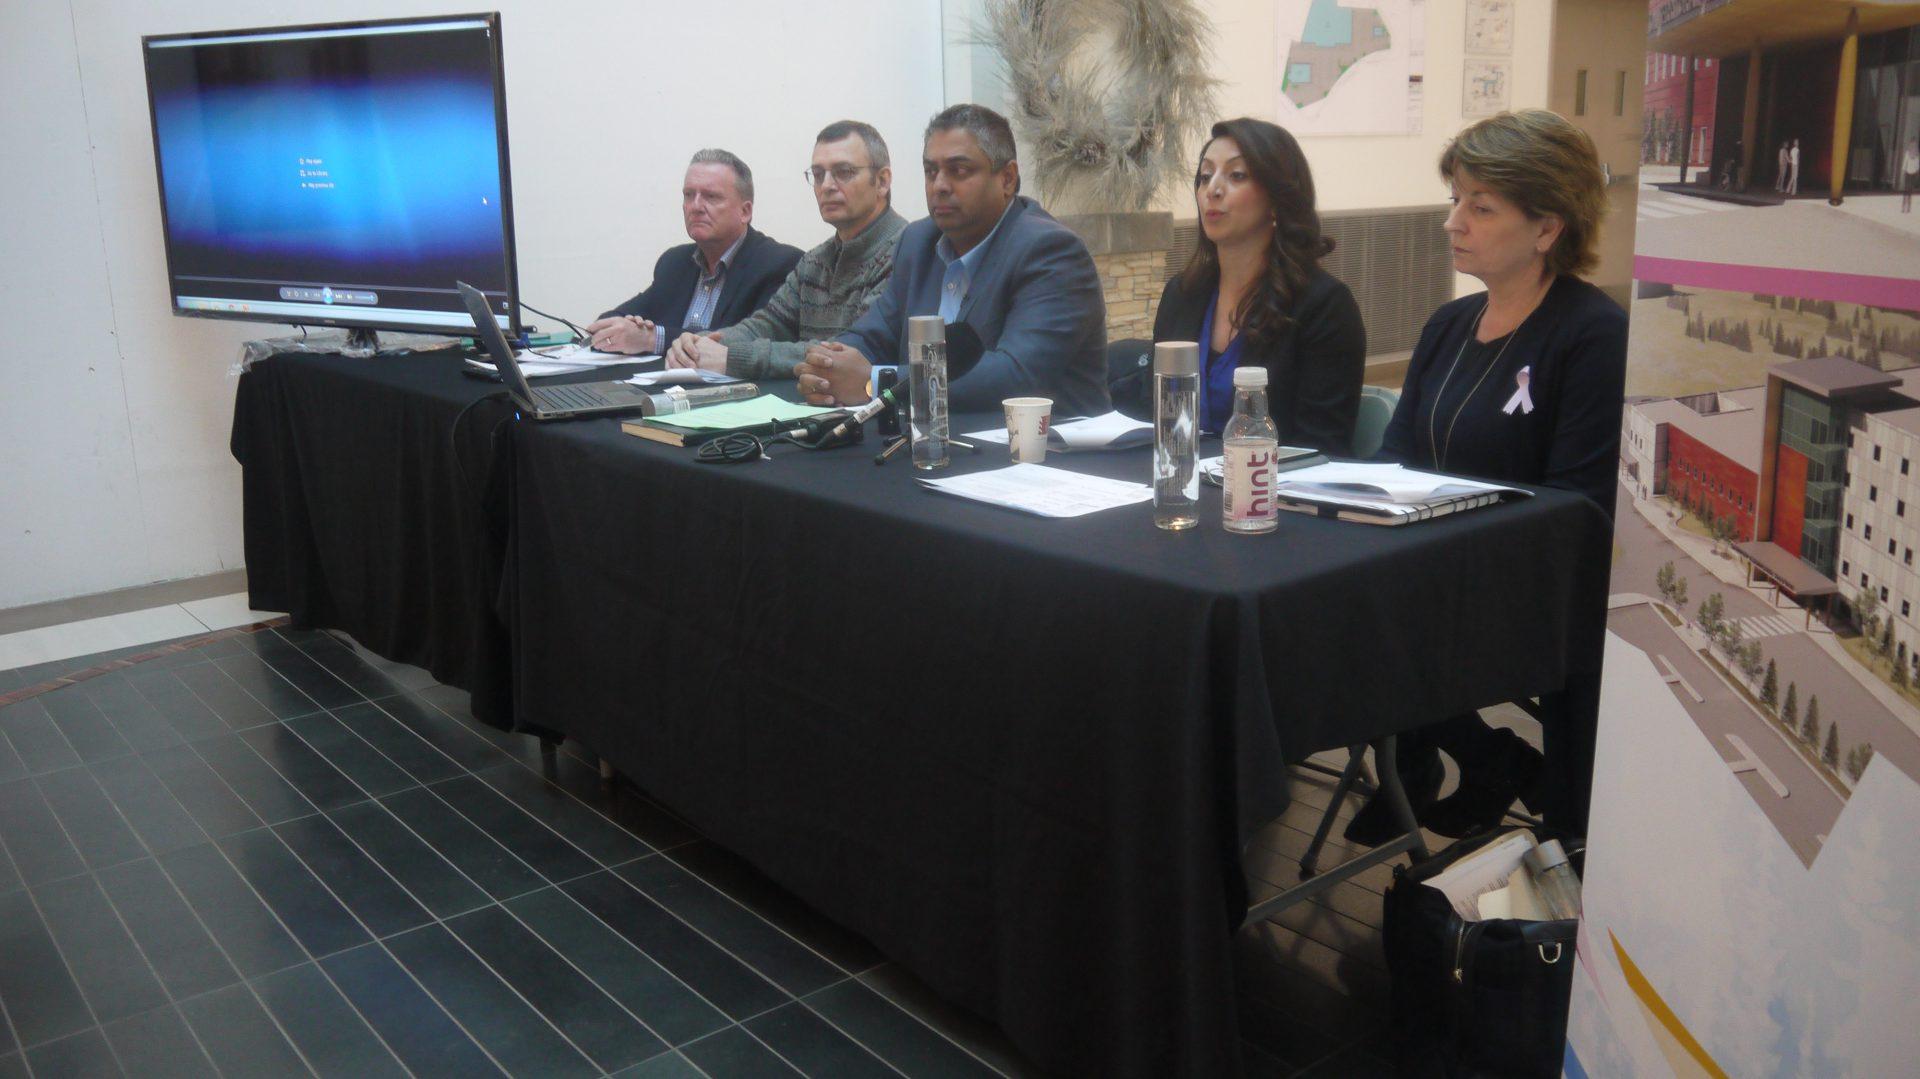 Patrick Cannon, left, Mike Burns, Sandy Kalgutkar, Jeannie Dhaliwal and Sue Cullen led Thursday's technical briefing.